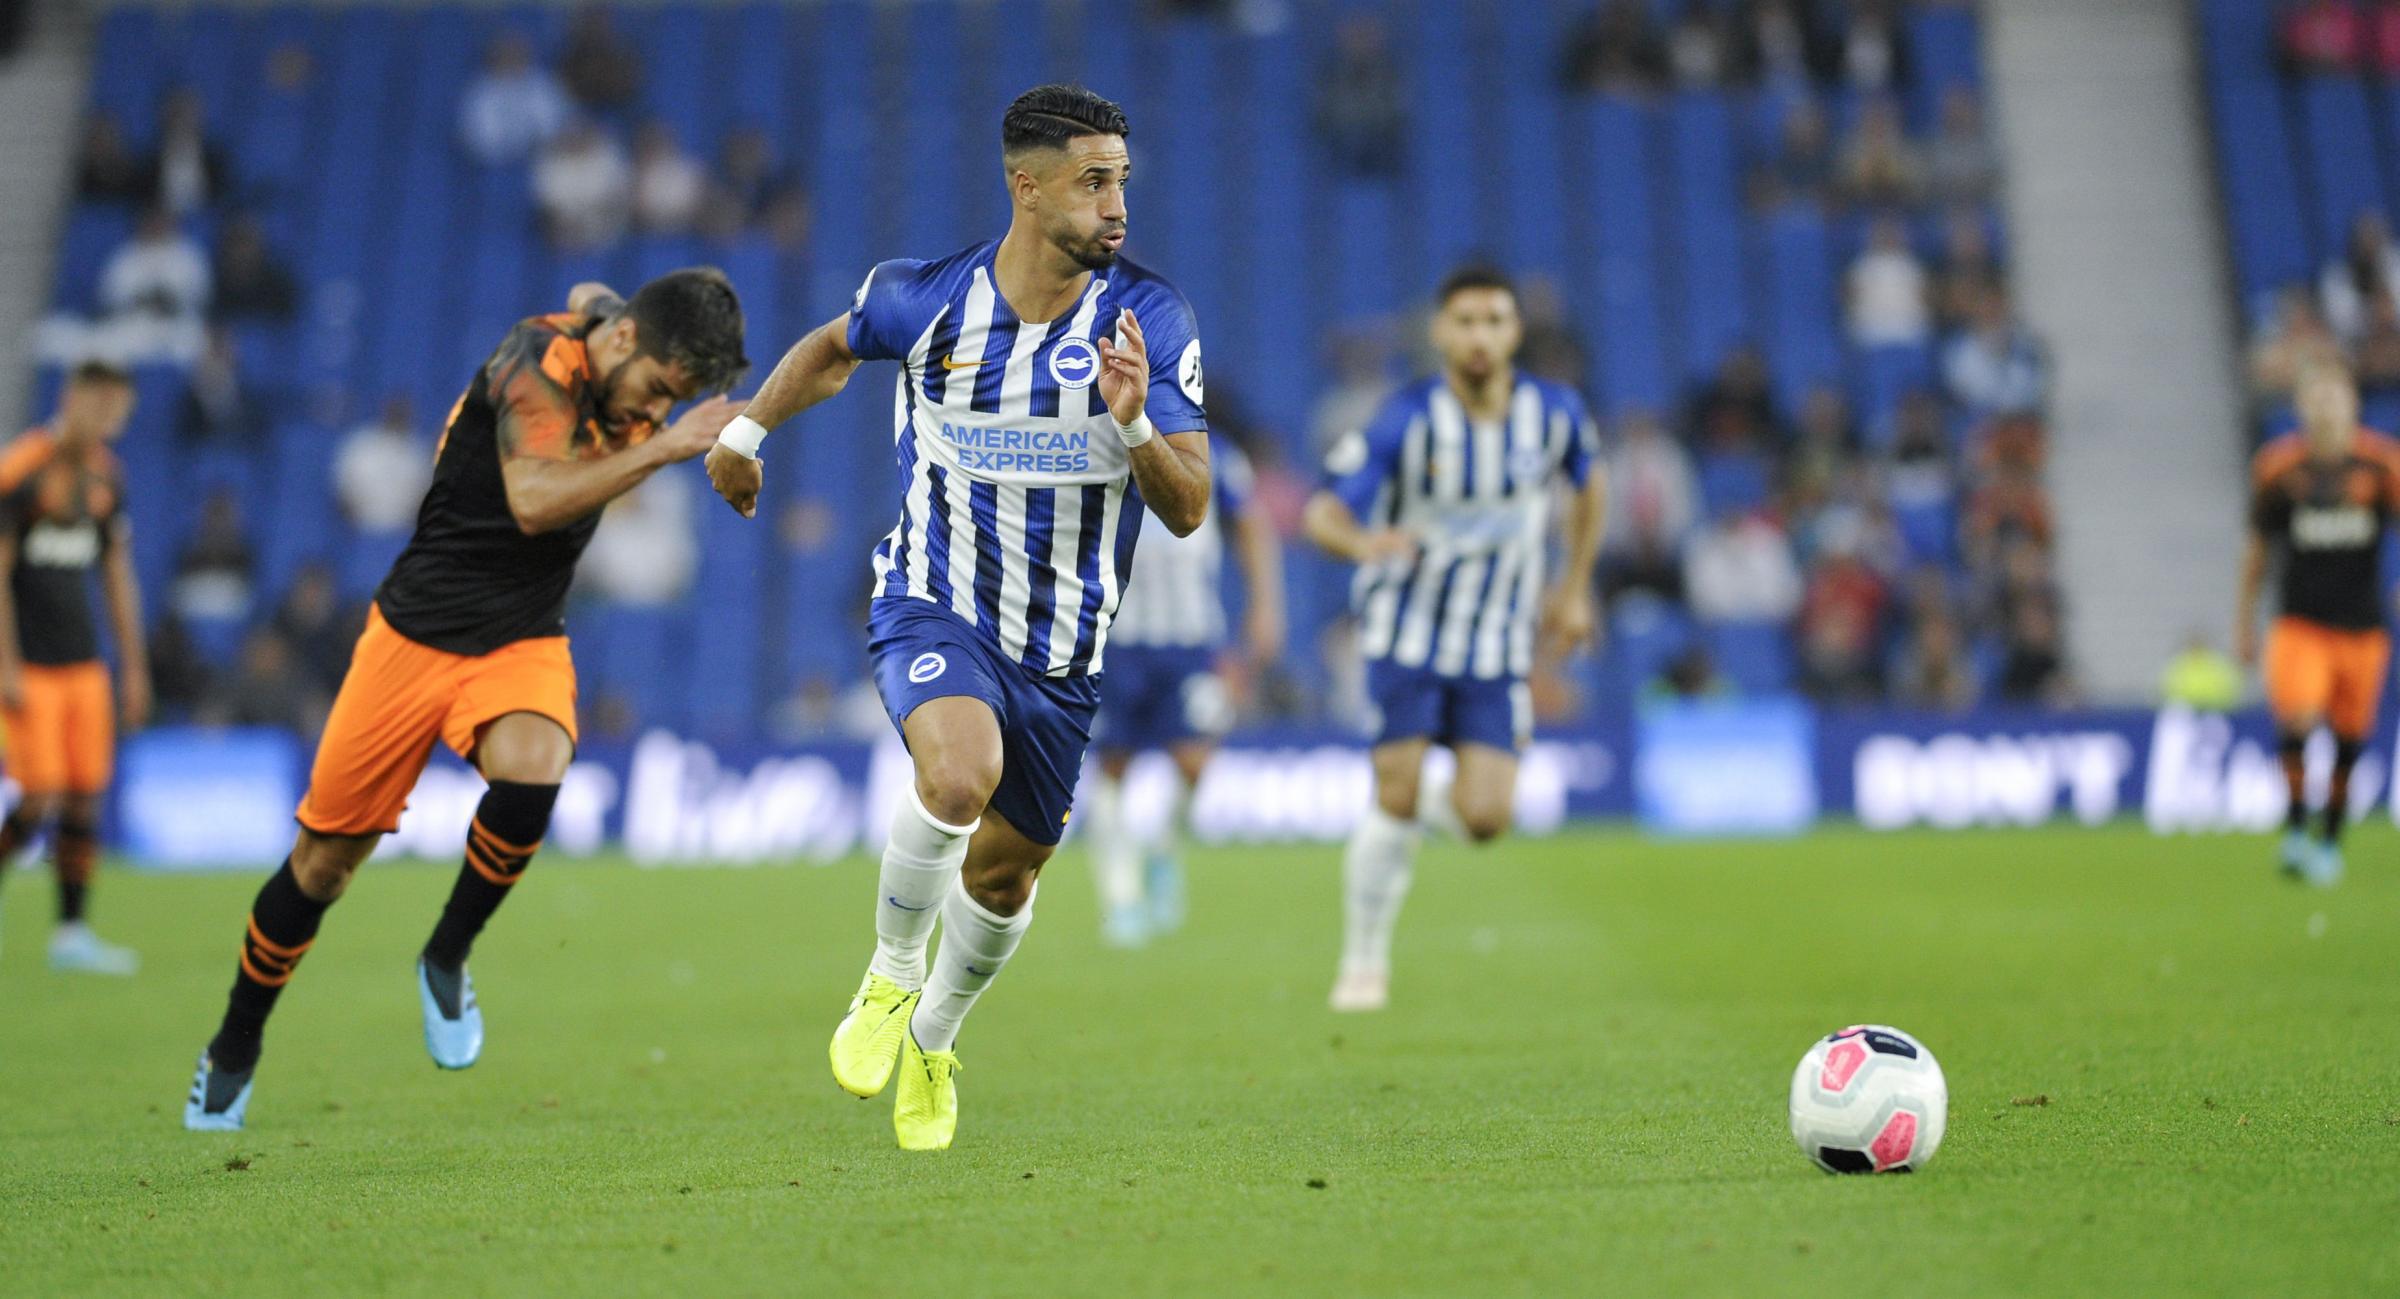 Beram Kayal back at Albion after loan deal is cut short